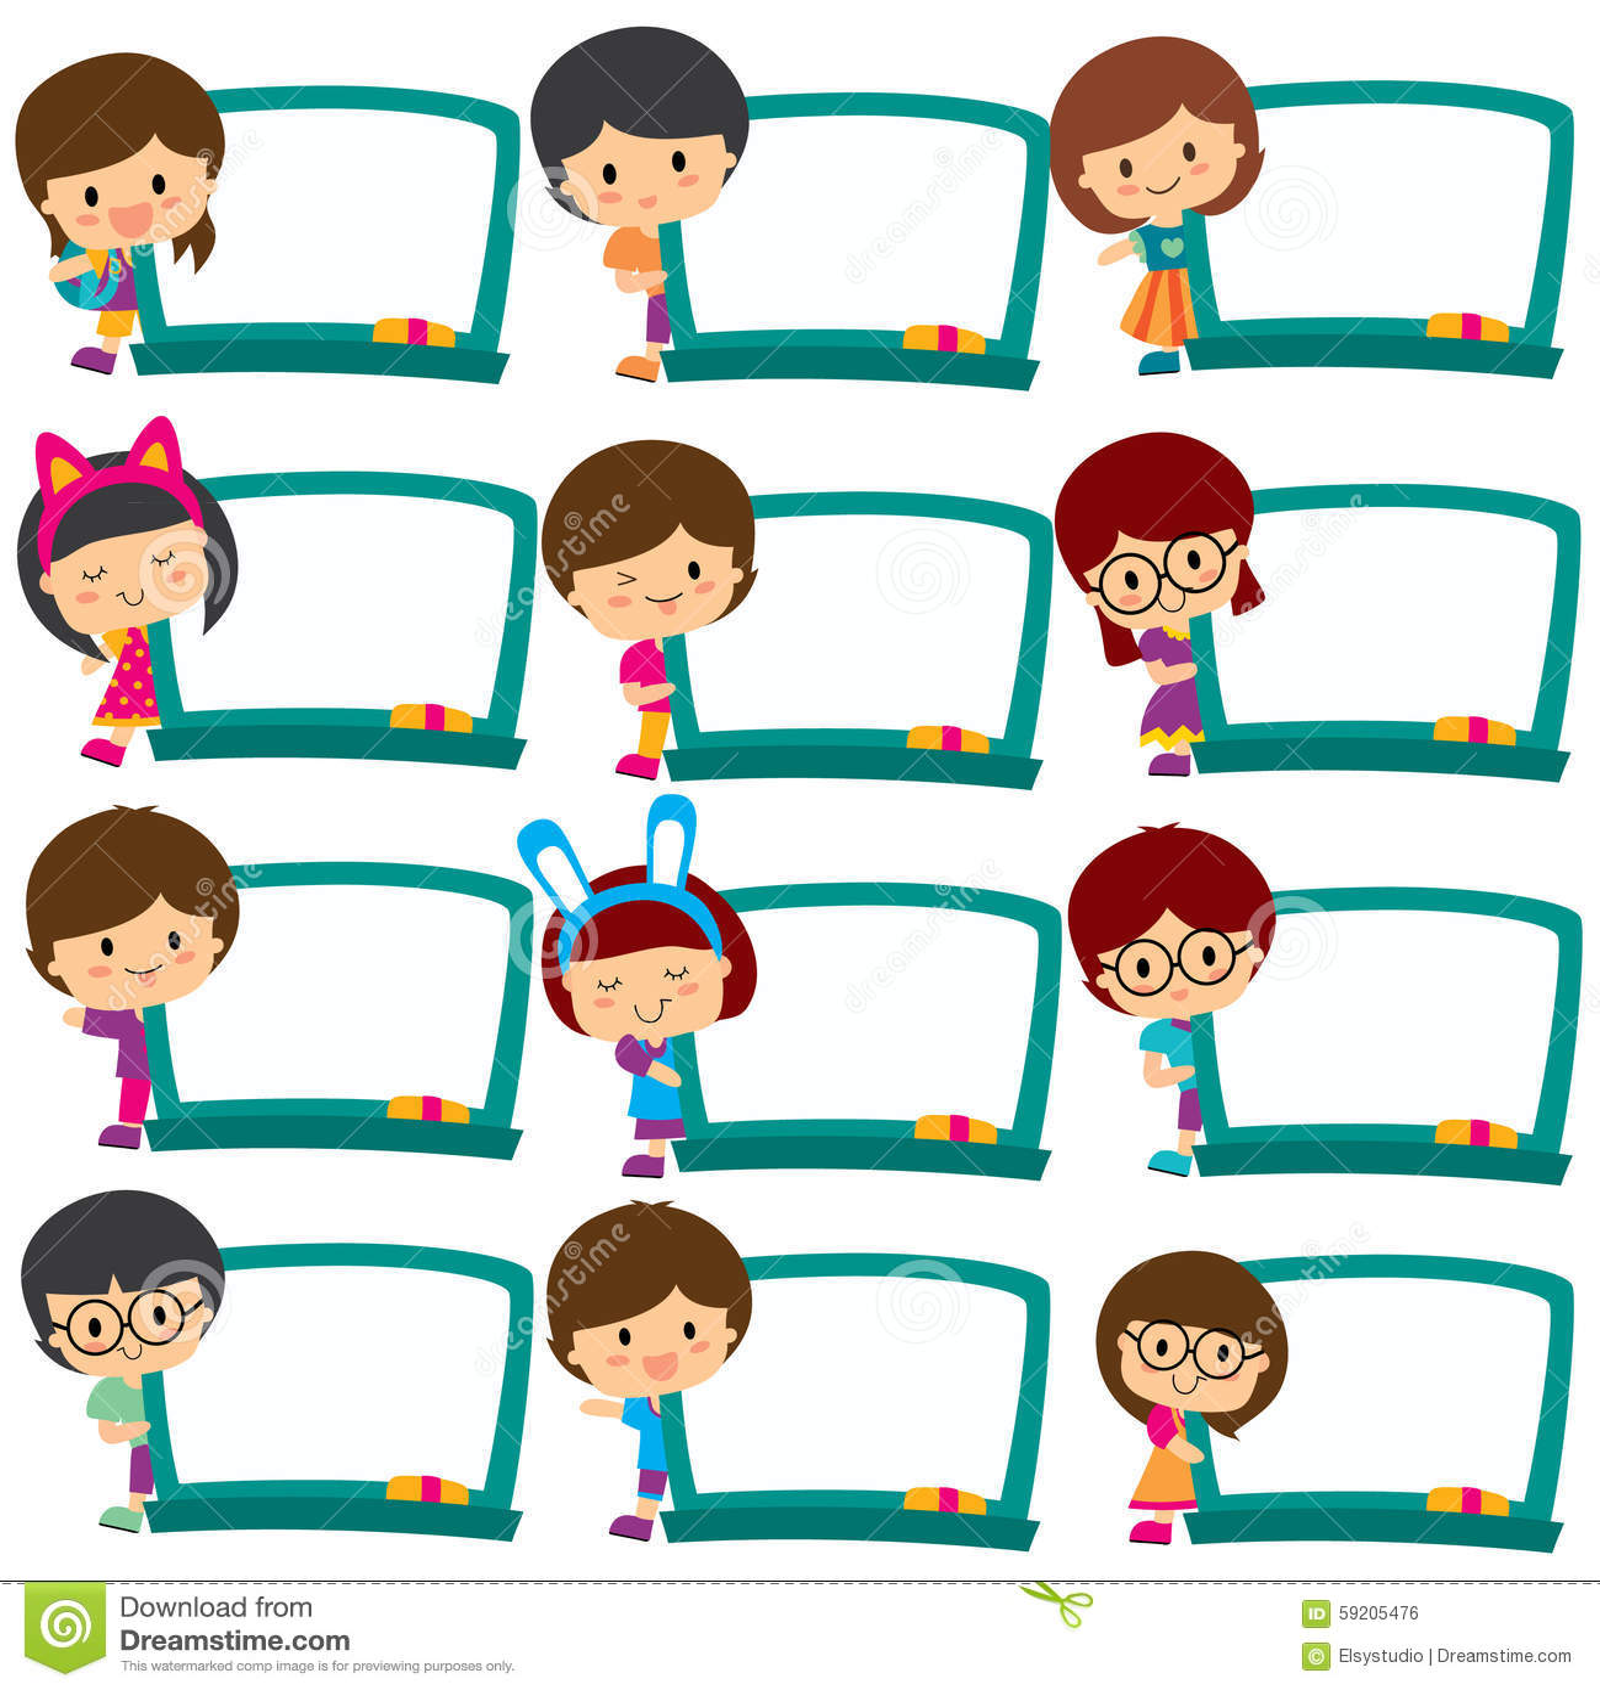 Kids Board Frames Clip Art Set Stock Vector - Image: 59205476